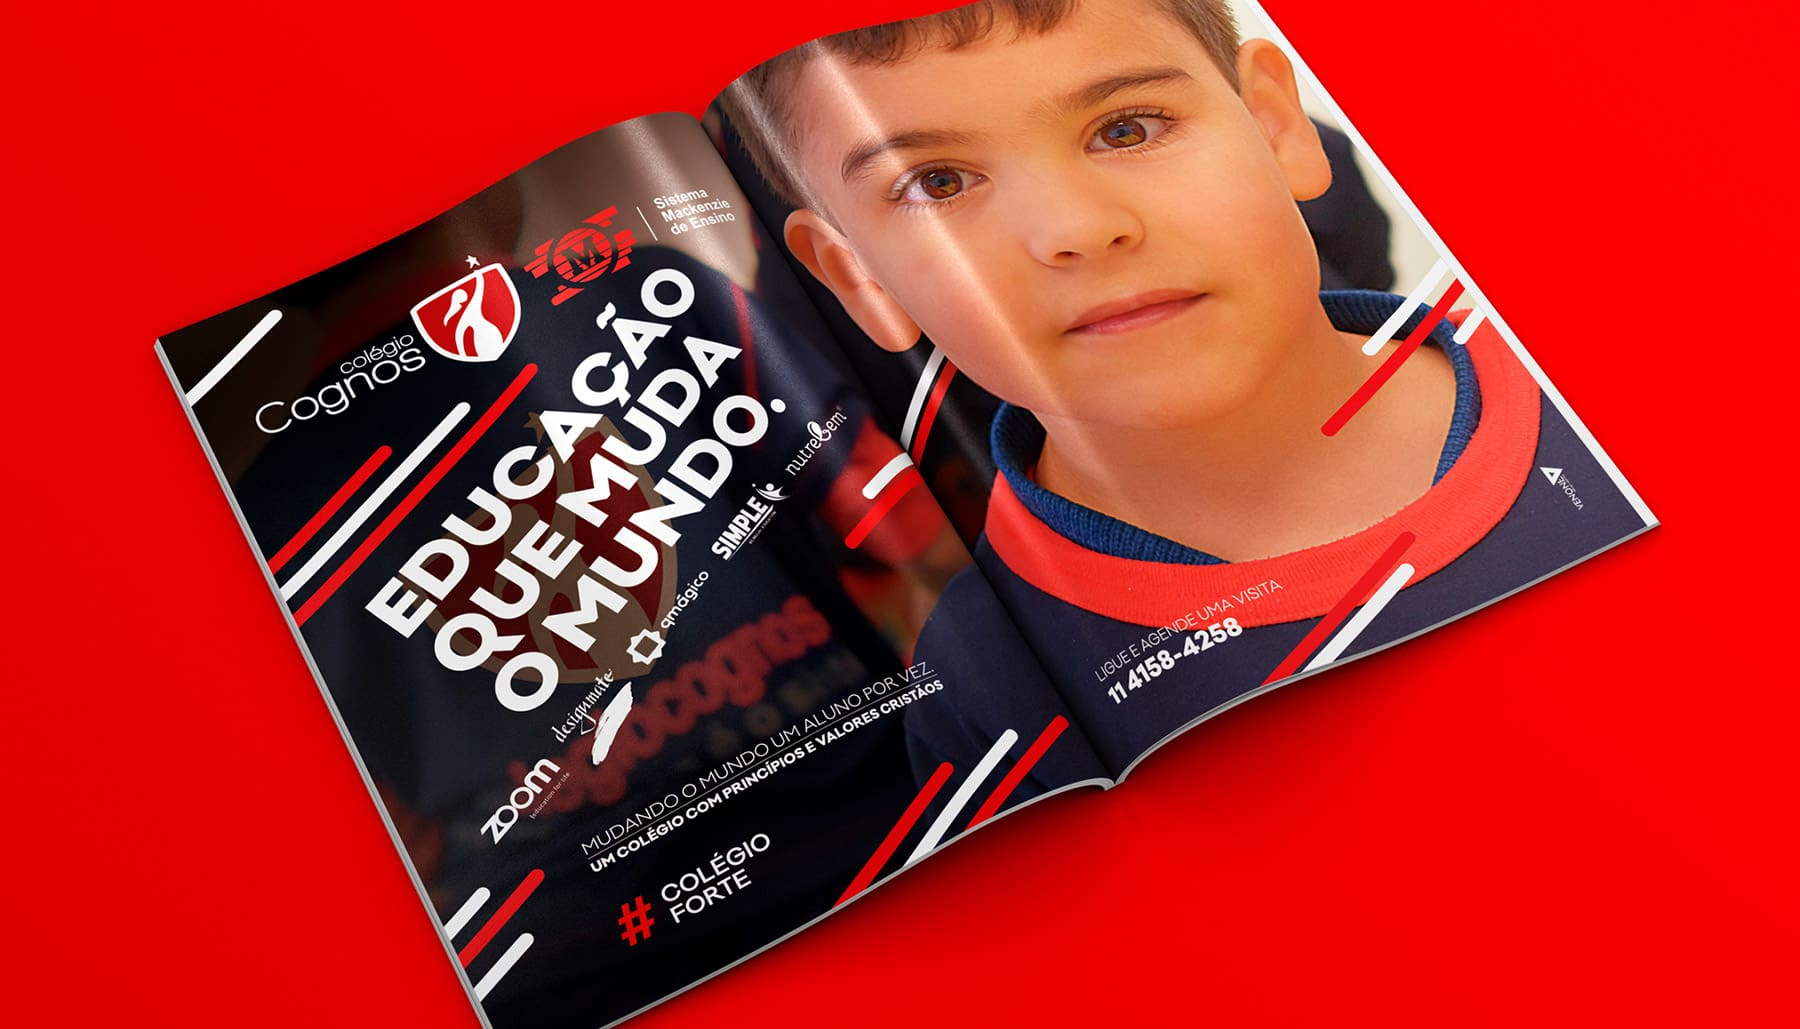 Colégio Cognos - VENONE design Agency